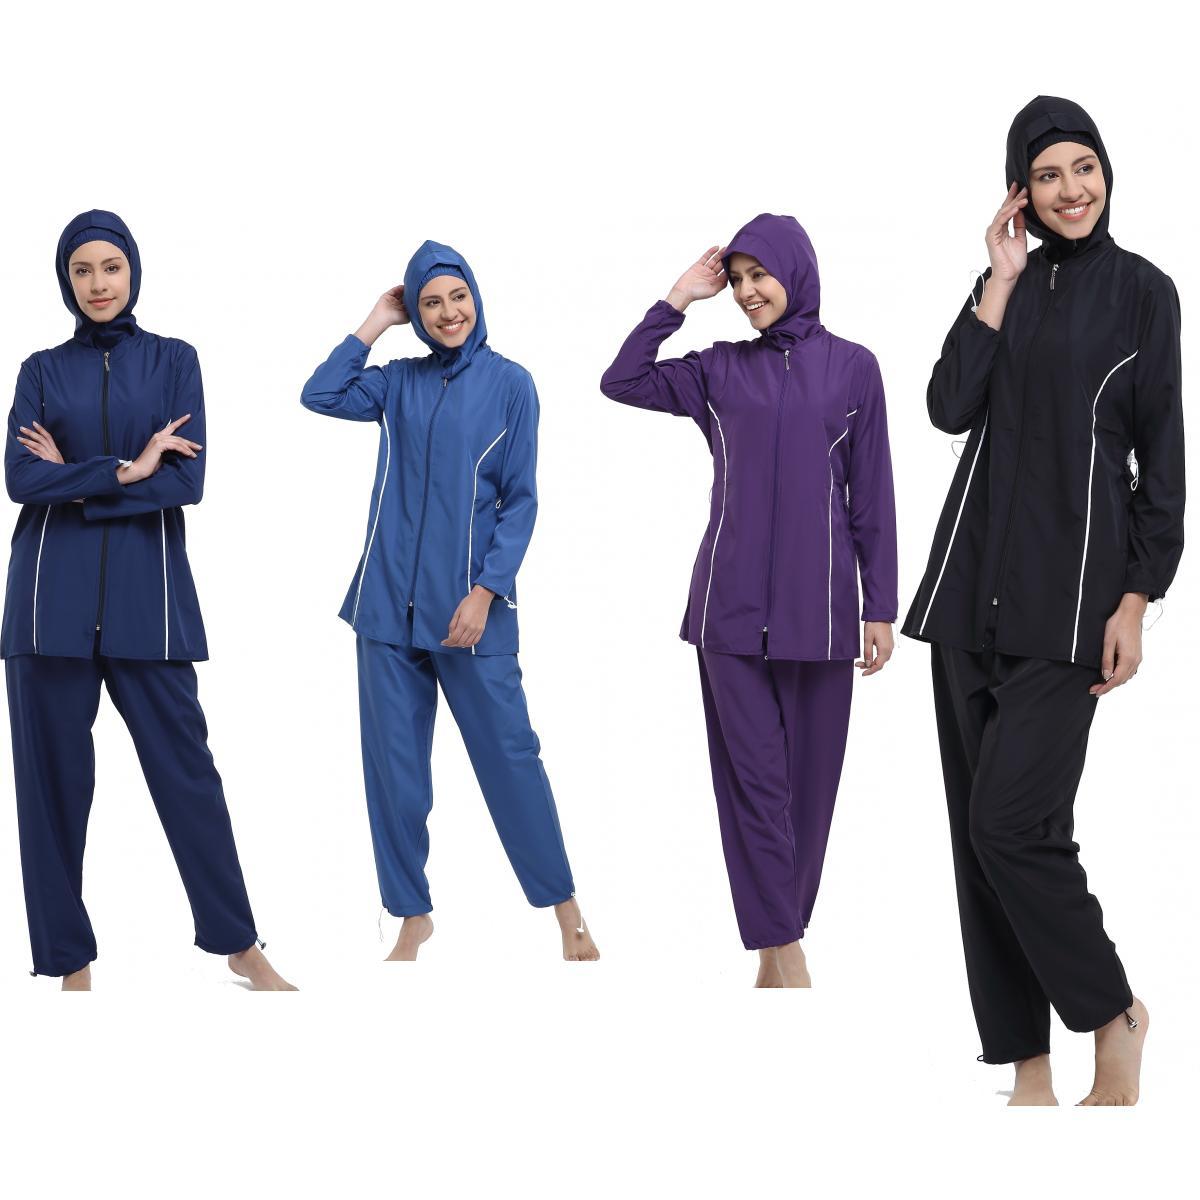 Argisa 7101 Straight Piping Hijab Swimwear S-5XL Plus Size Muslim Hijab Islamic Swimsuit Swim Burkinis Full Cover